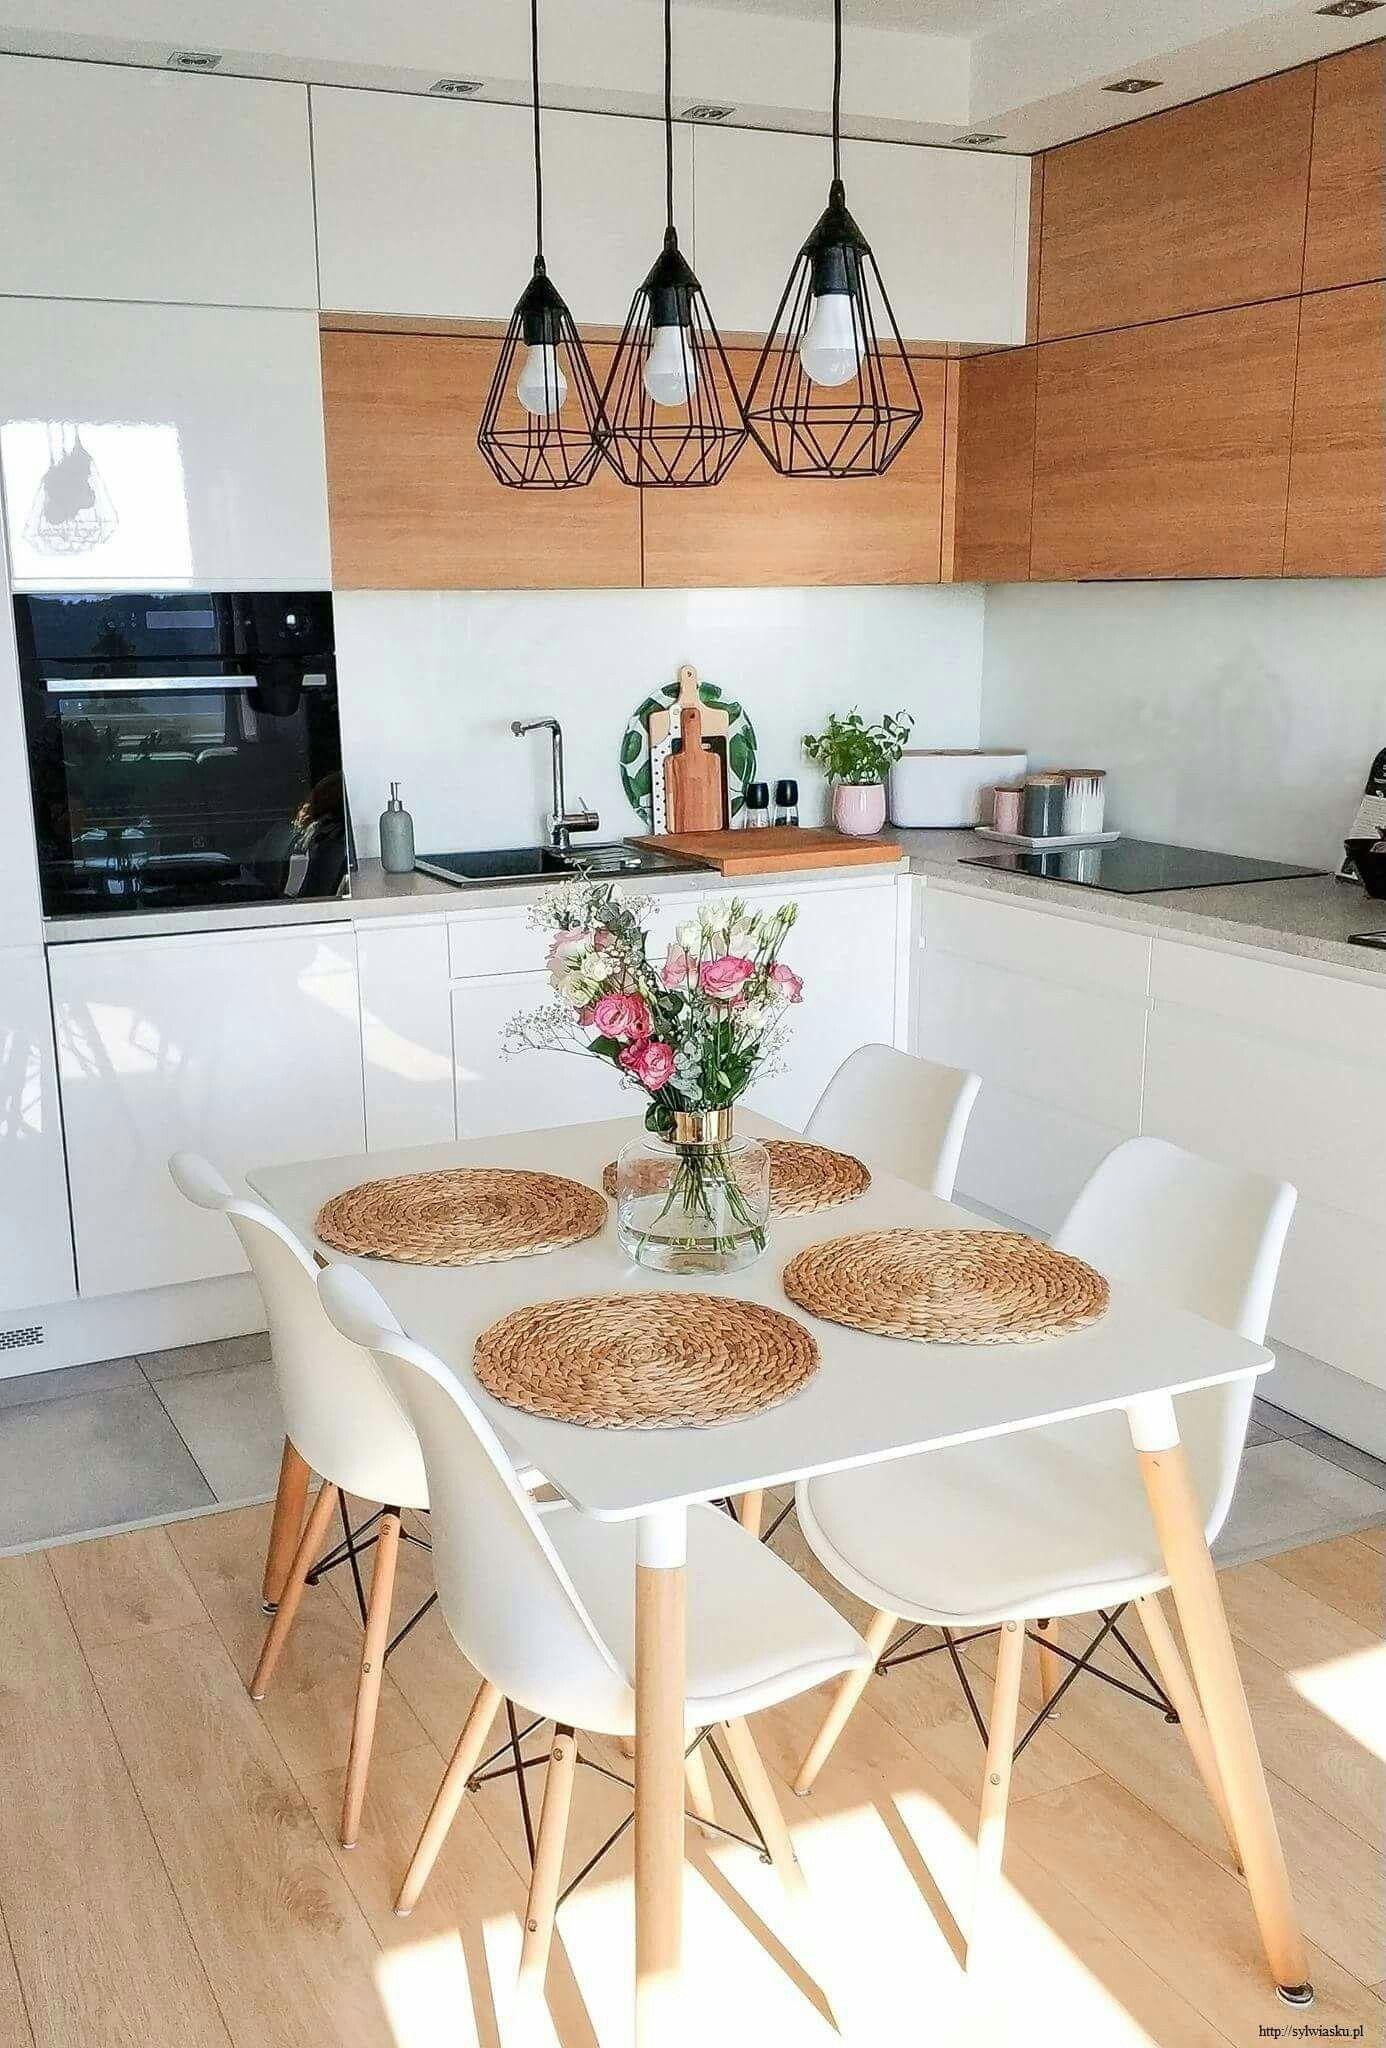 Pin By Misyeri Urdaneta Parrish On Ideas For A Small House Kitchen Decor Apartment Small Apartment Kitchen Home Decor Kitchen